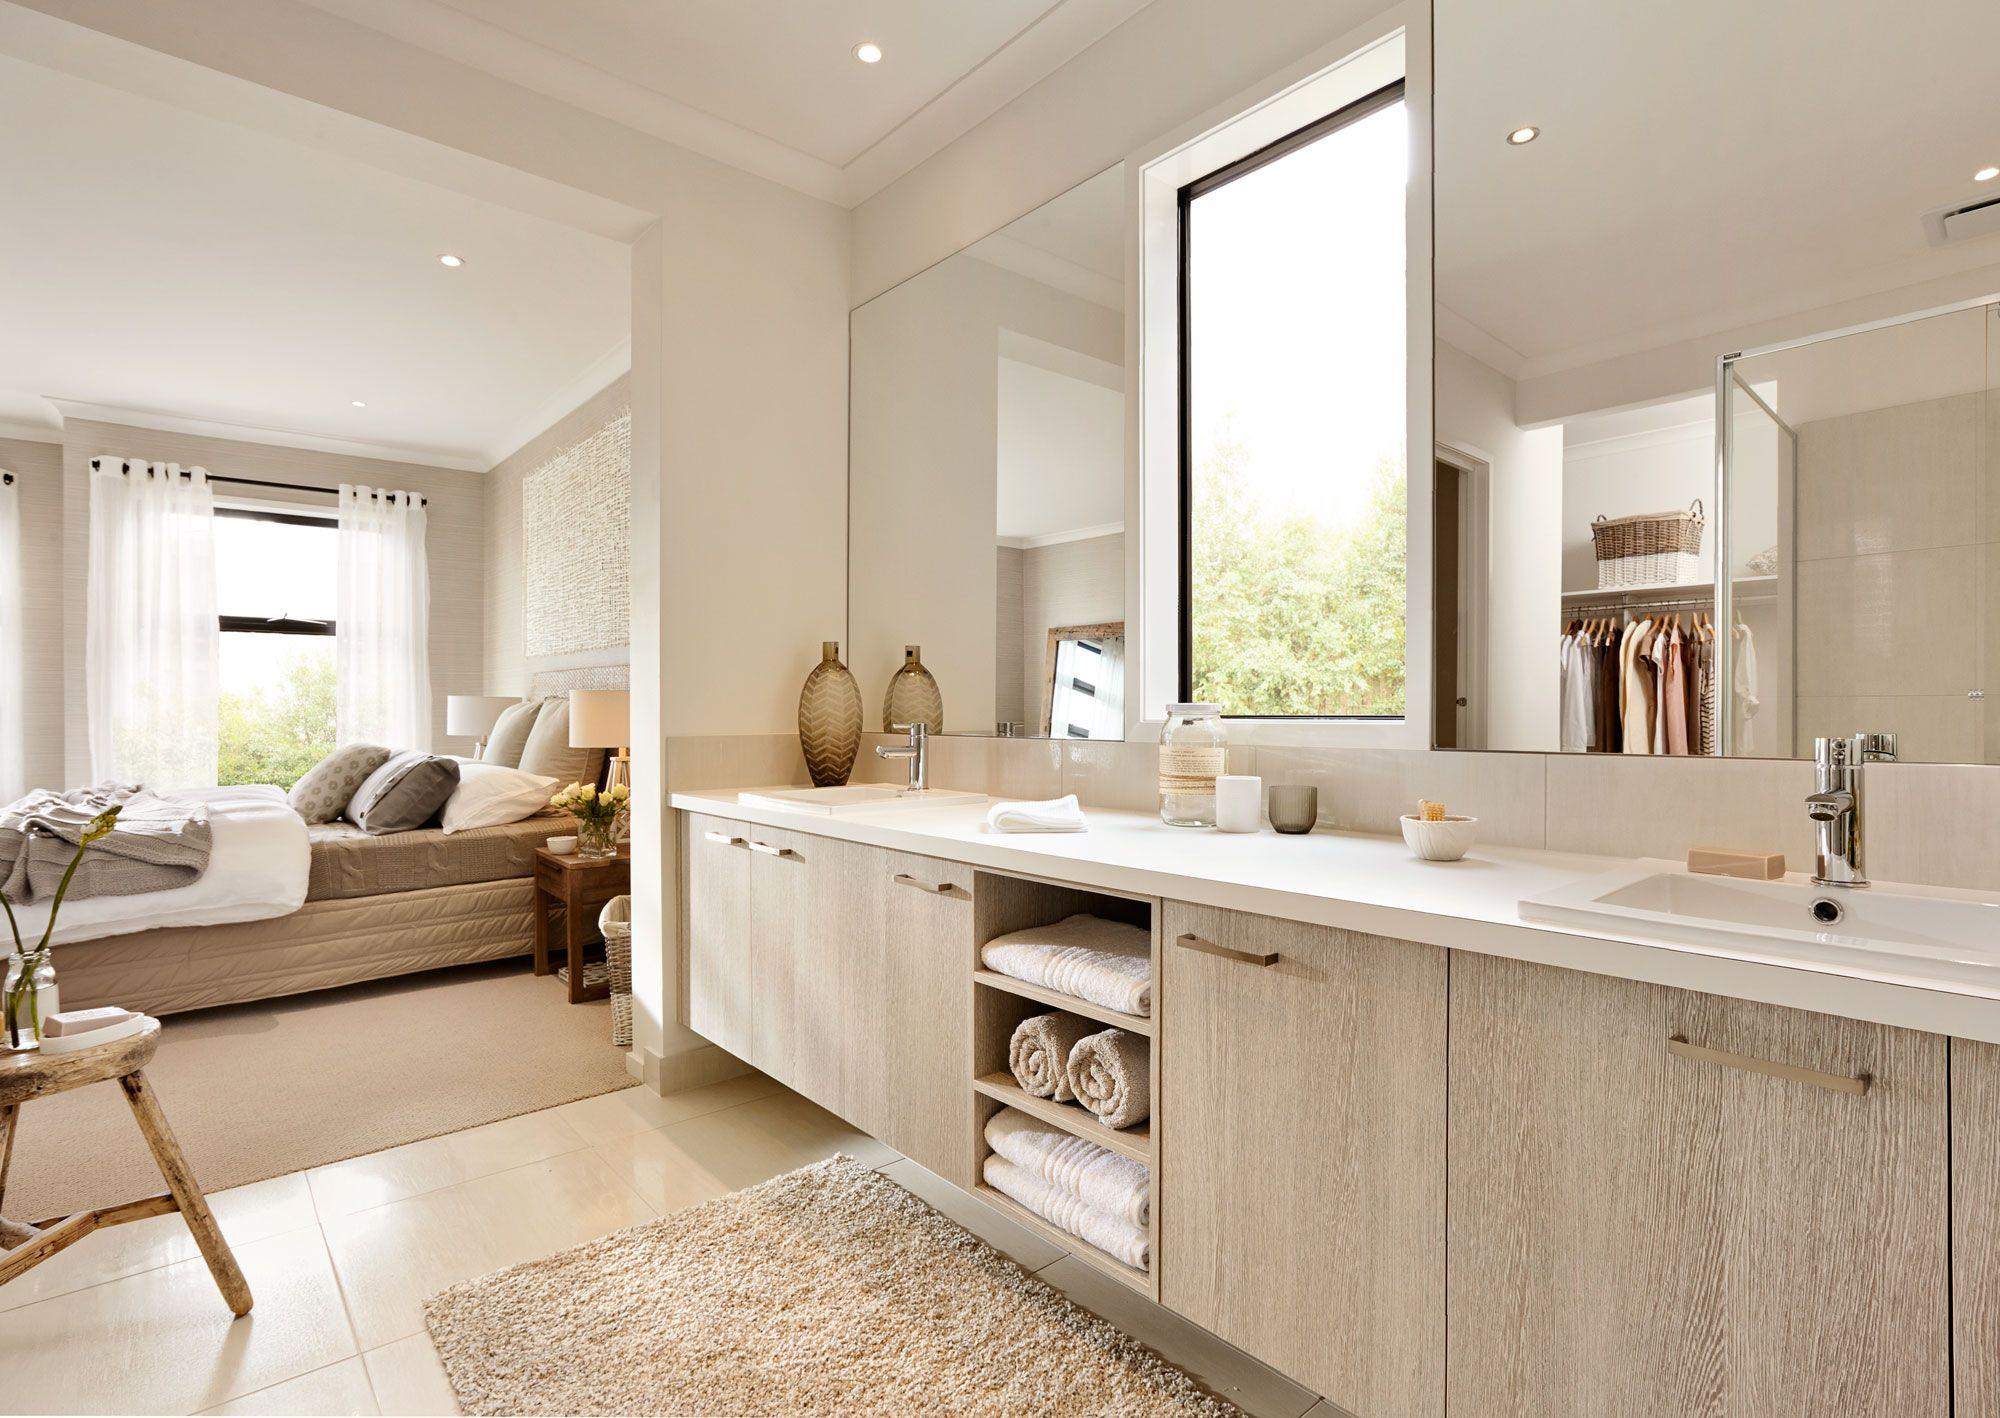 78 best Bathrooms images on Pinterest   Carlisle homes, House design ...